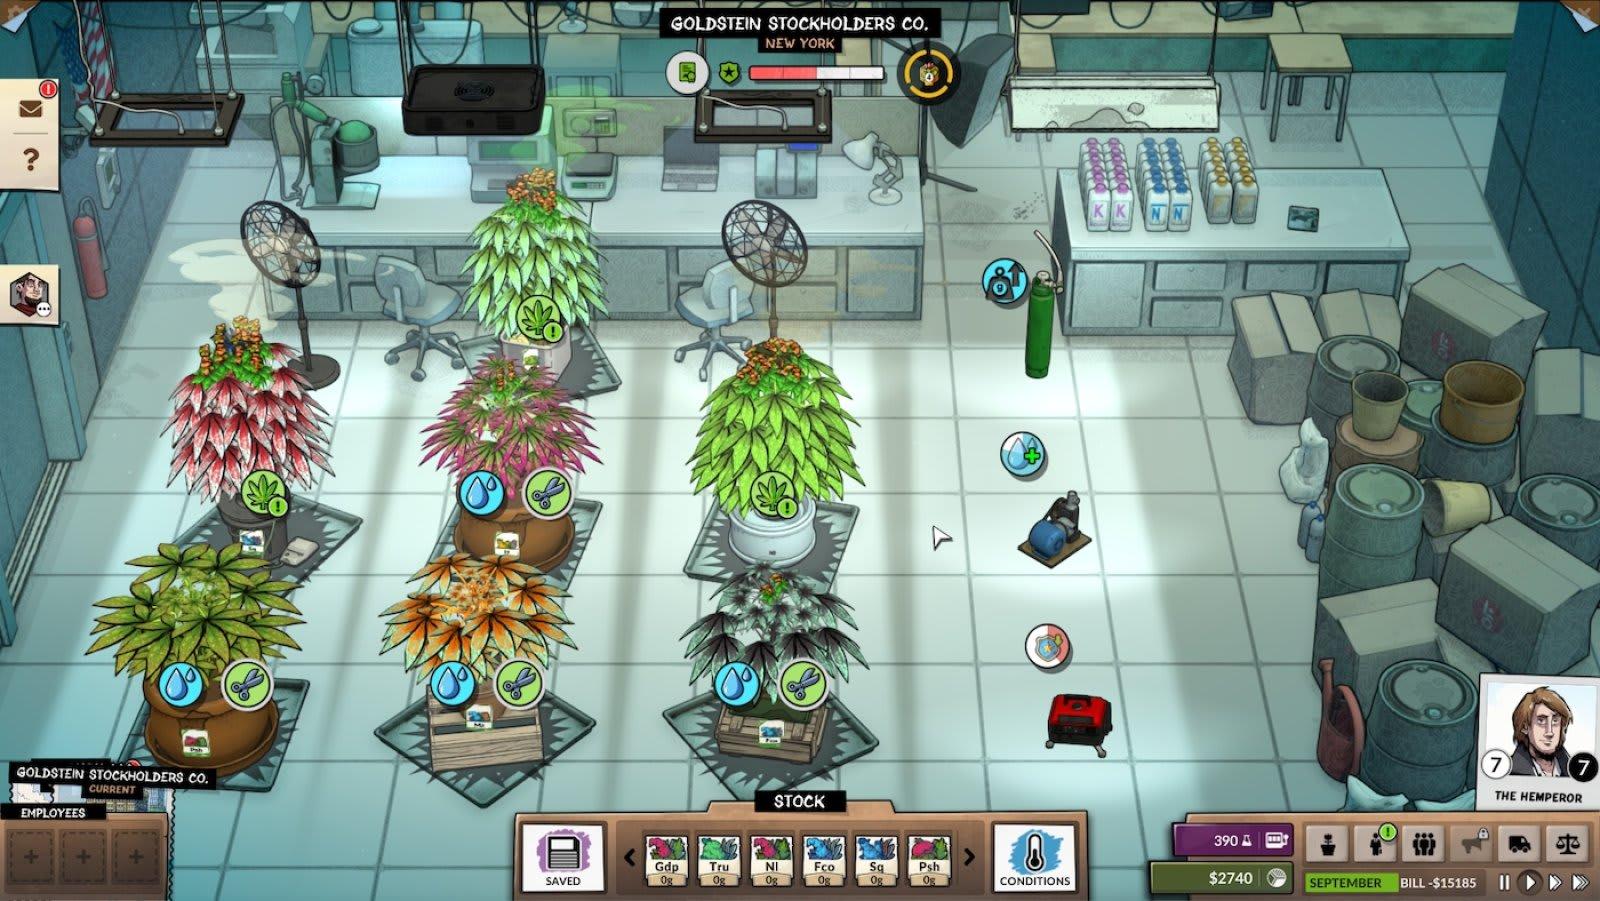 'High Maintenance' meets 'Civilization' in 'Weedcraft Inc'